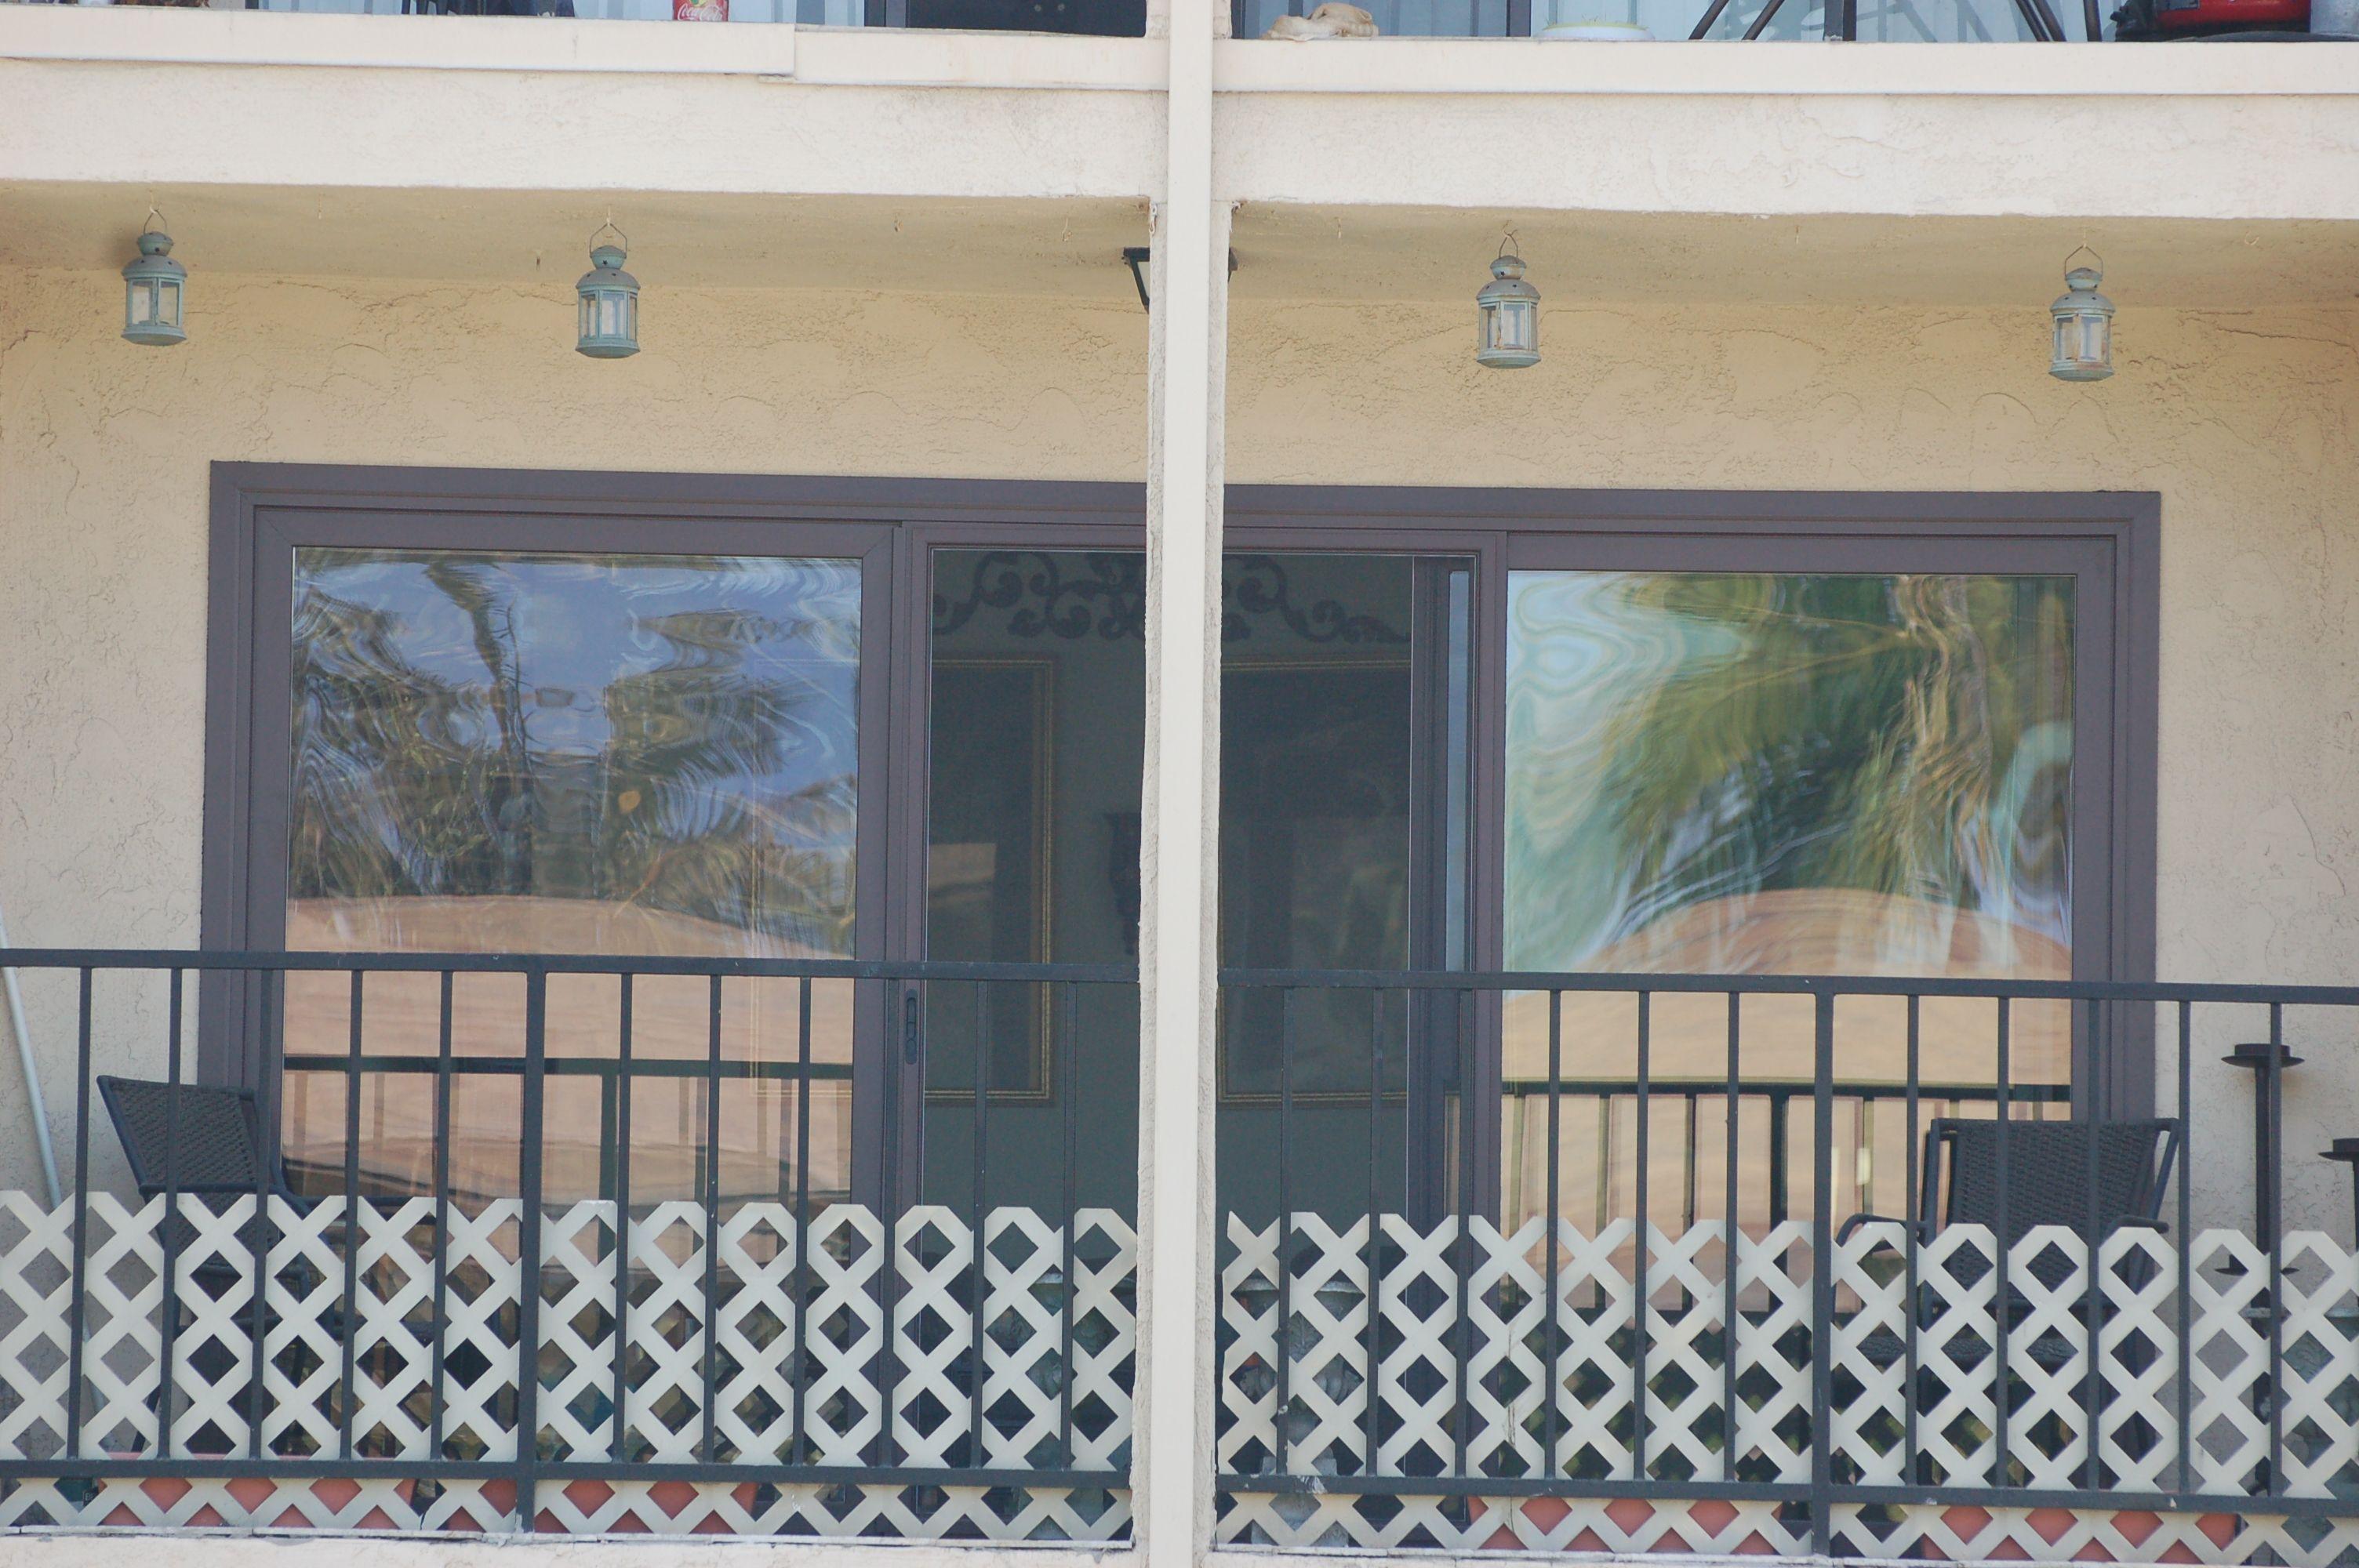 replacement reviews with home custom design door window glass sliding interesting windows wood doors plus siding depot inspiring milgard and denver